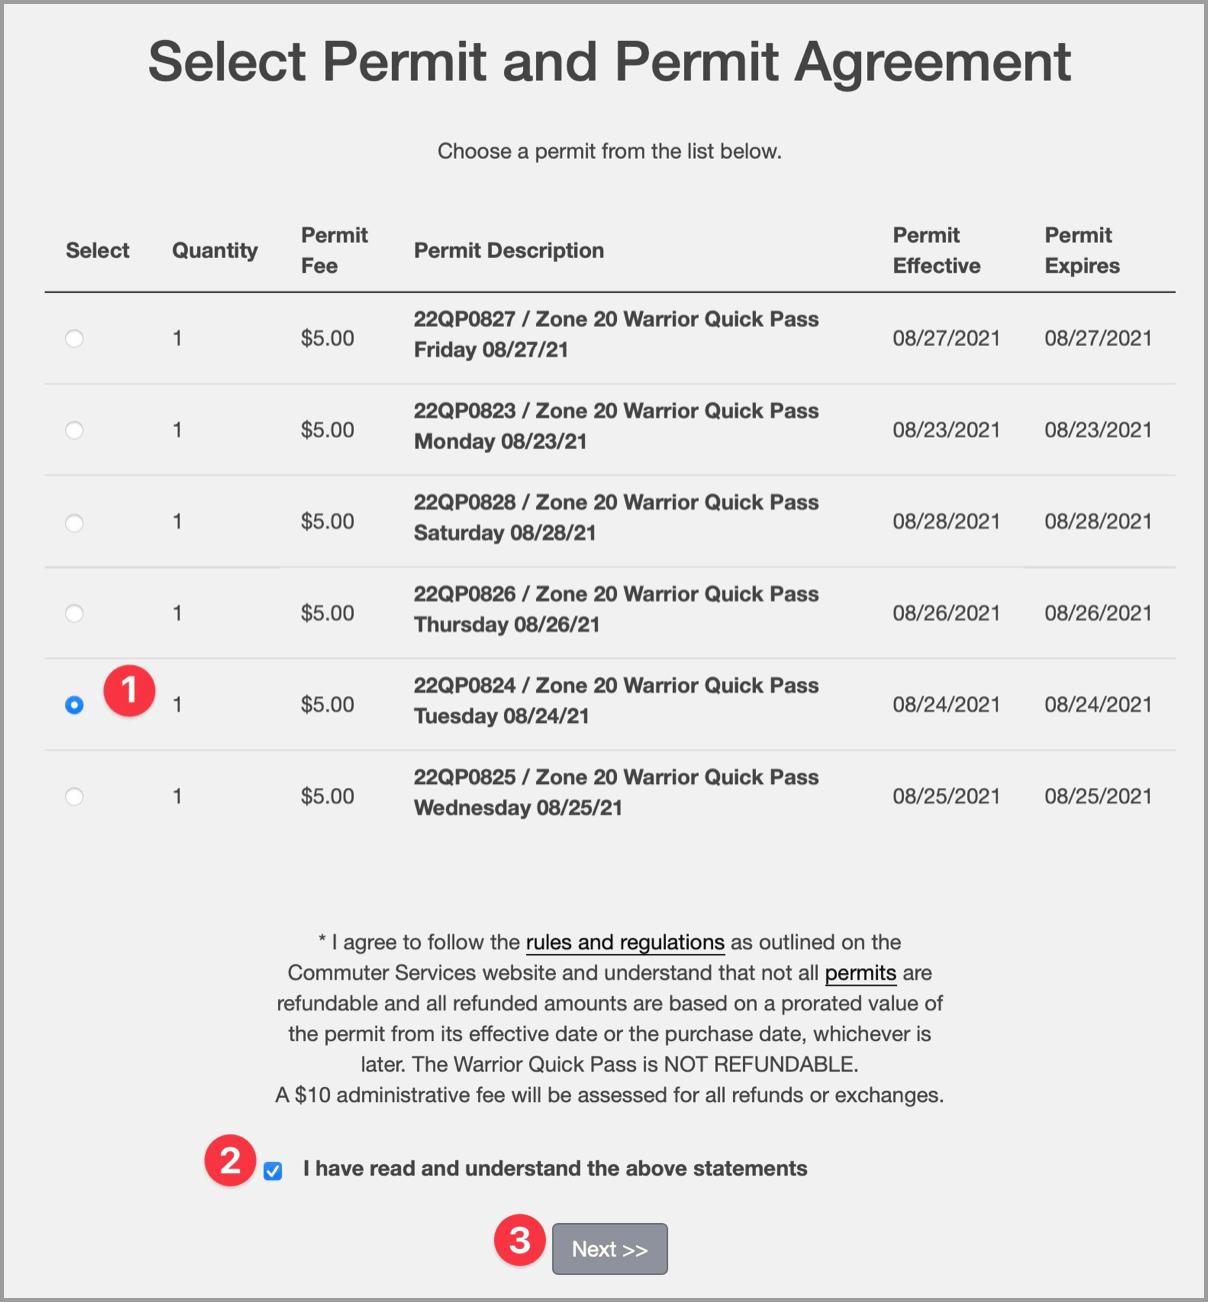 Select Permit